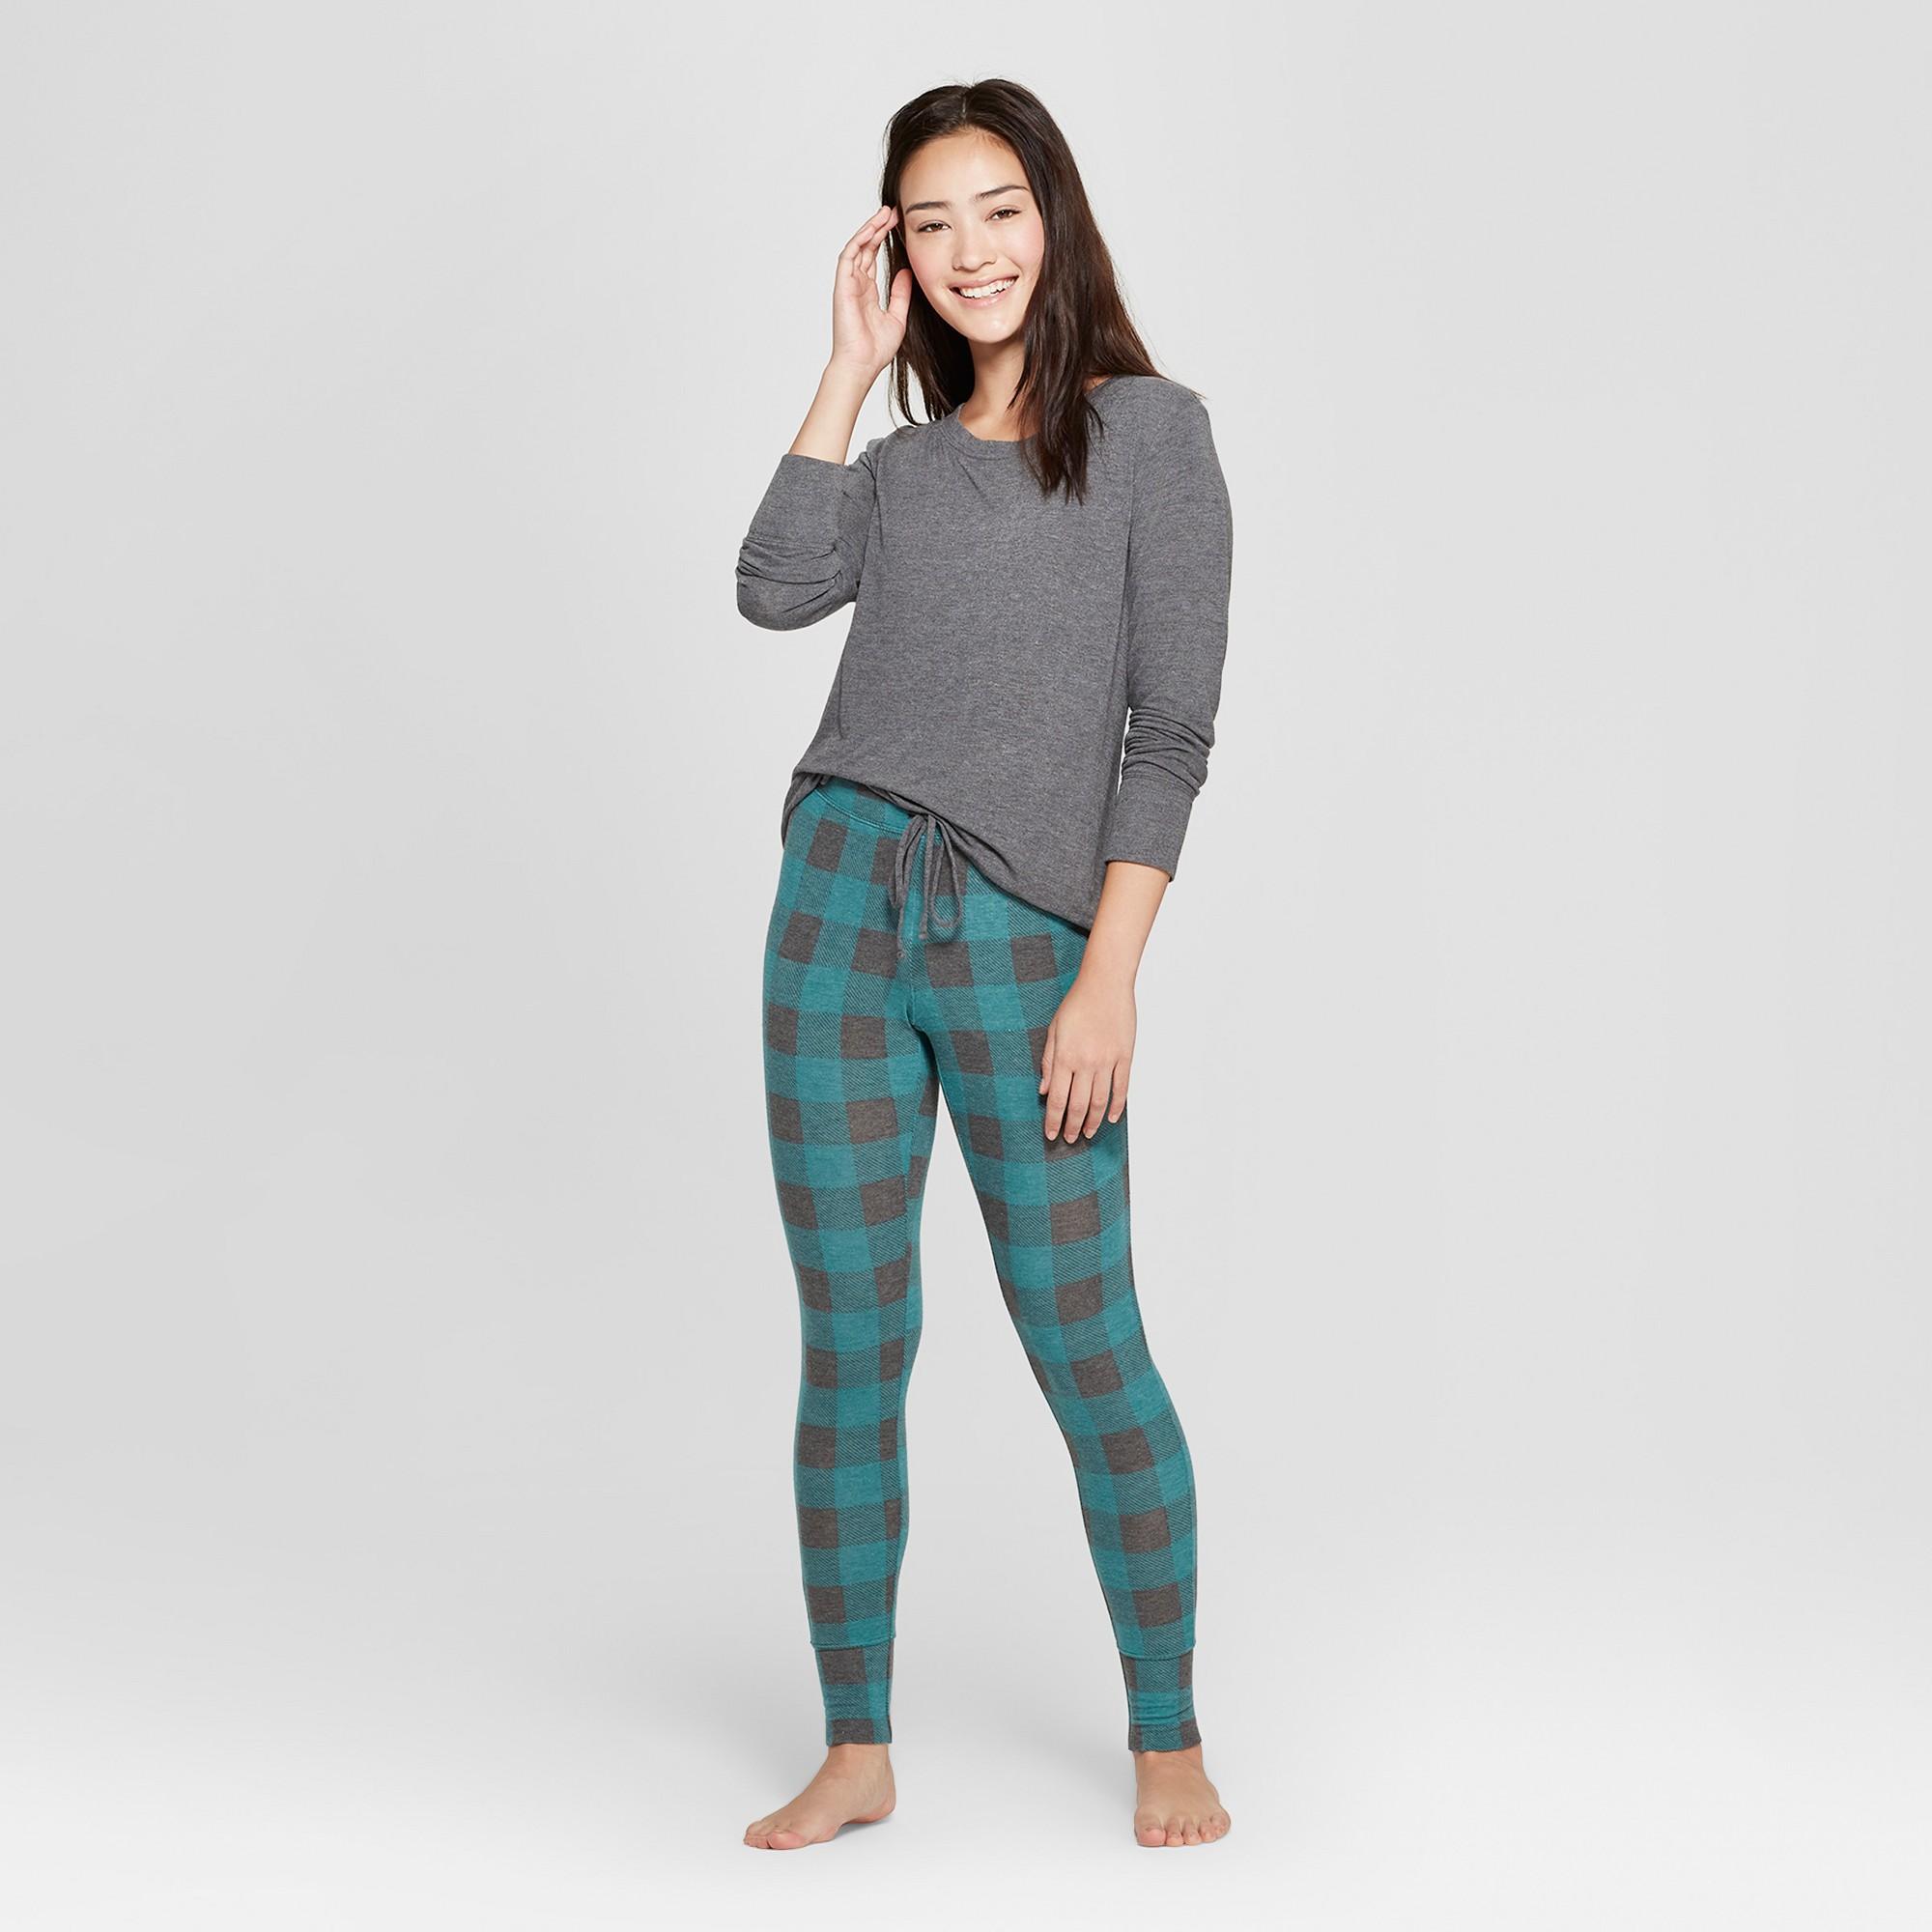 eb1ff4242d61 Women s Cozy Pajama Set - Xhilaration Green XS